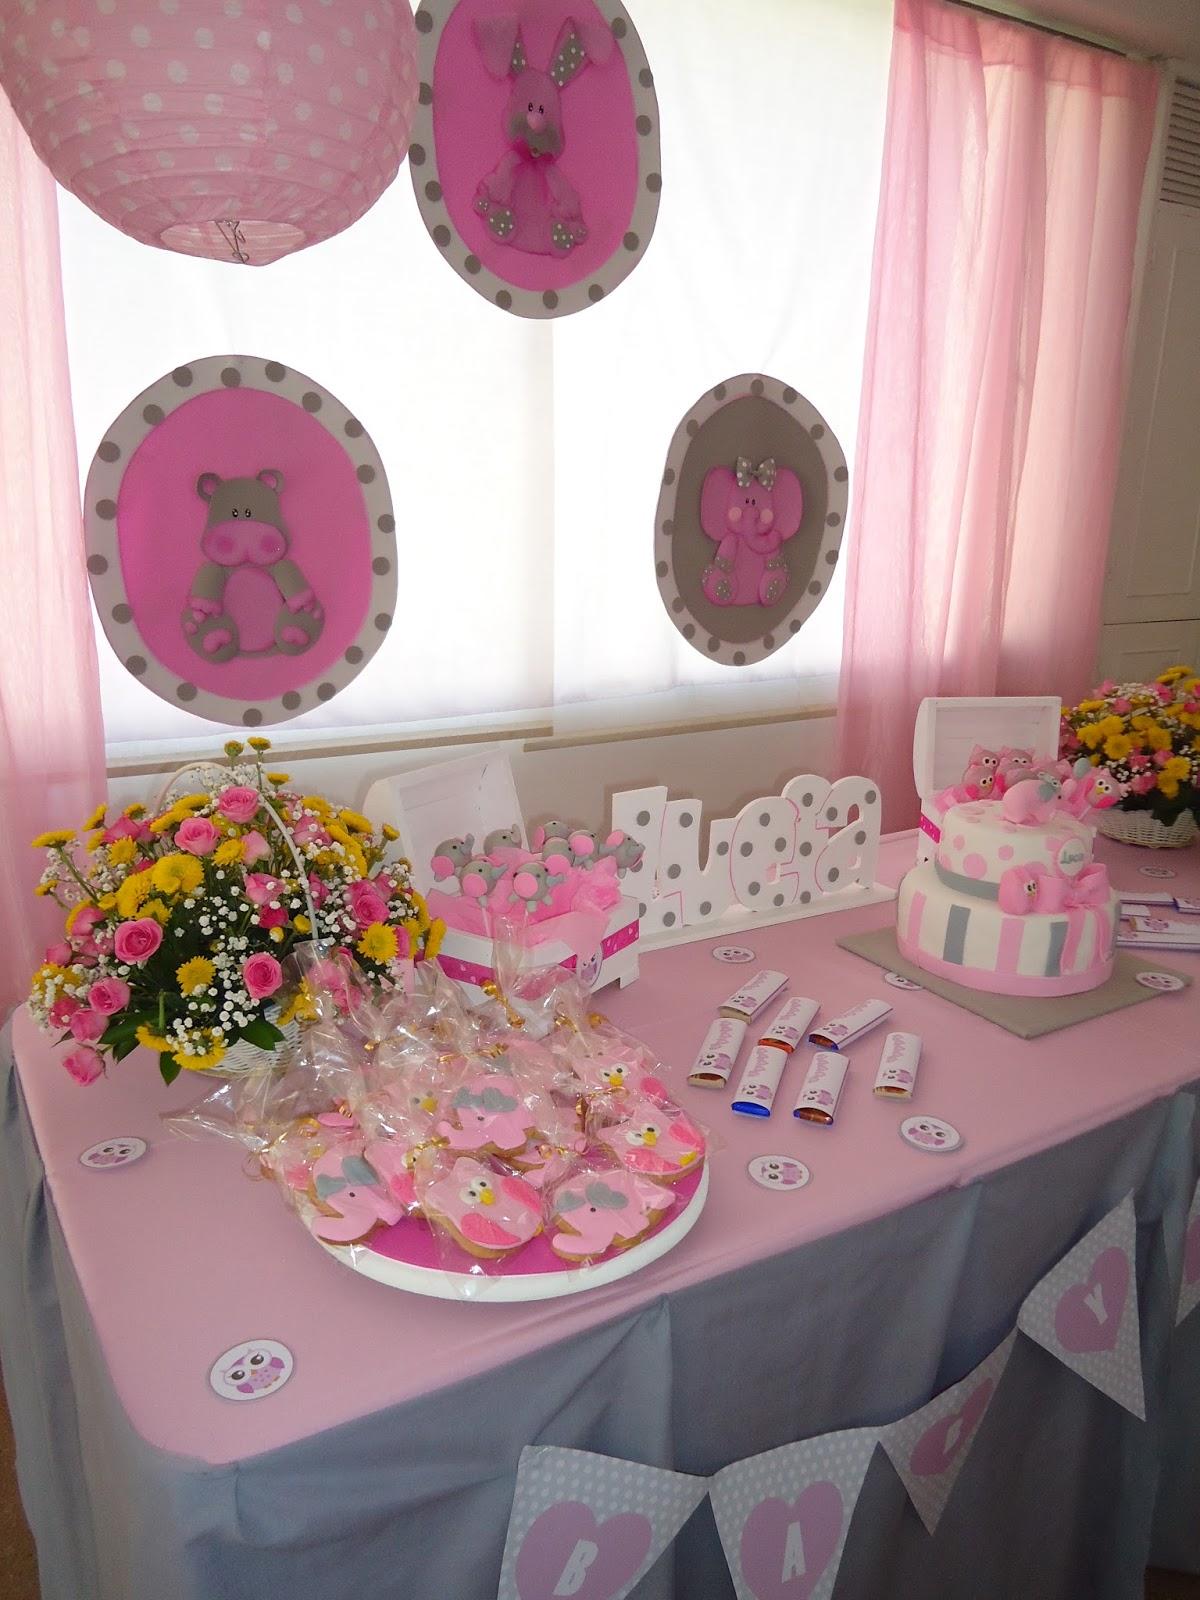 Decoracion para baby shower mujer 2016 - Decoracion baby shower ...